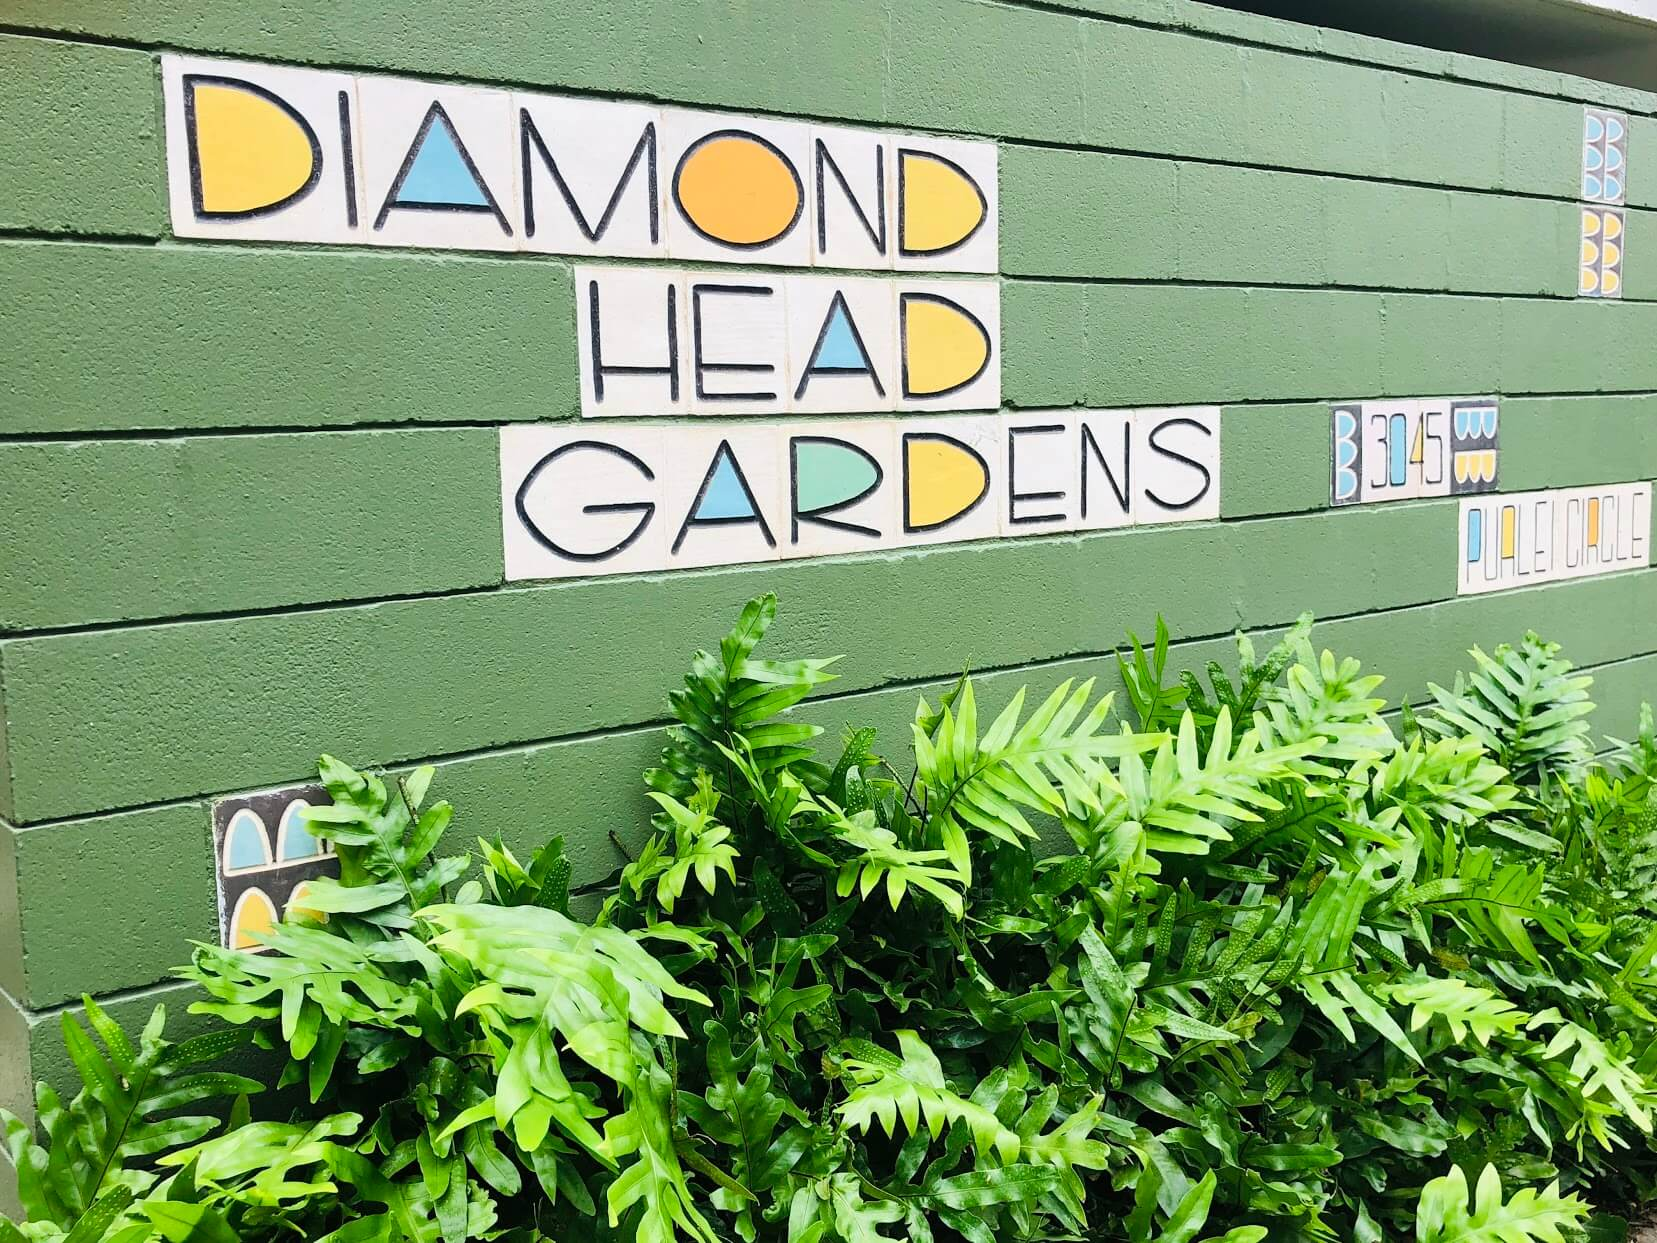 Diamond Head Gardensの看板